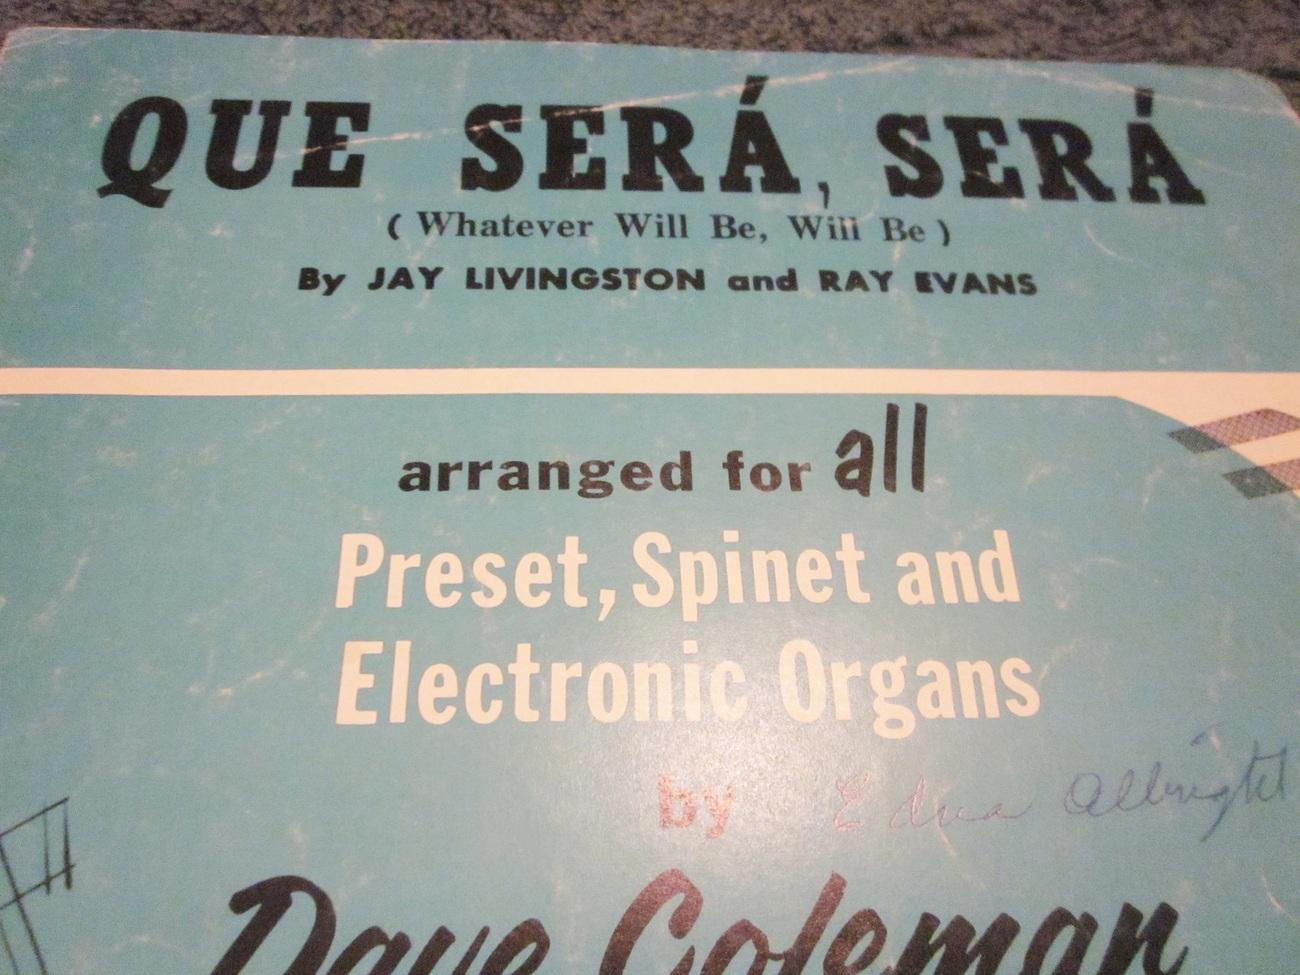 Sheet Music Qe Sera, Sera by Dave Coleman for the Organ